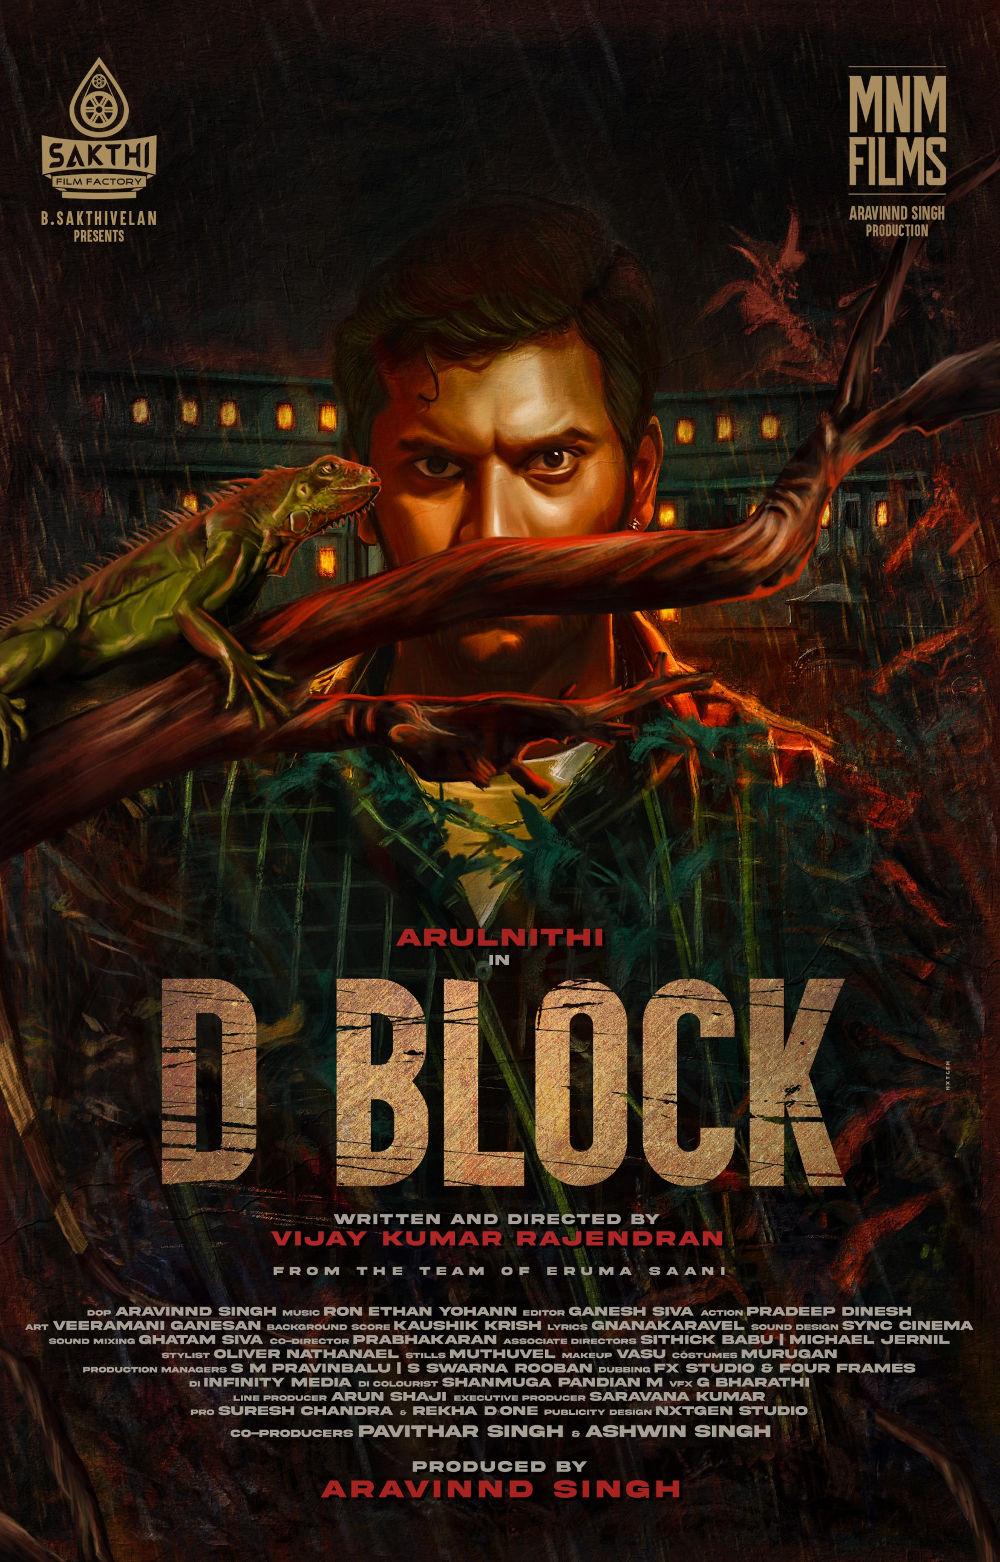 Actor Arulnithi D Block Movie HD Poster